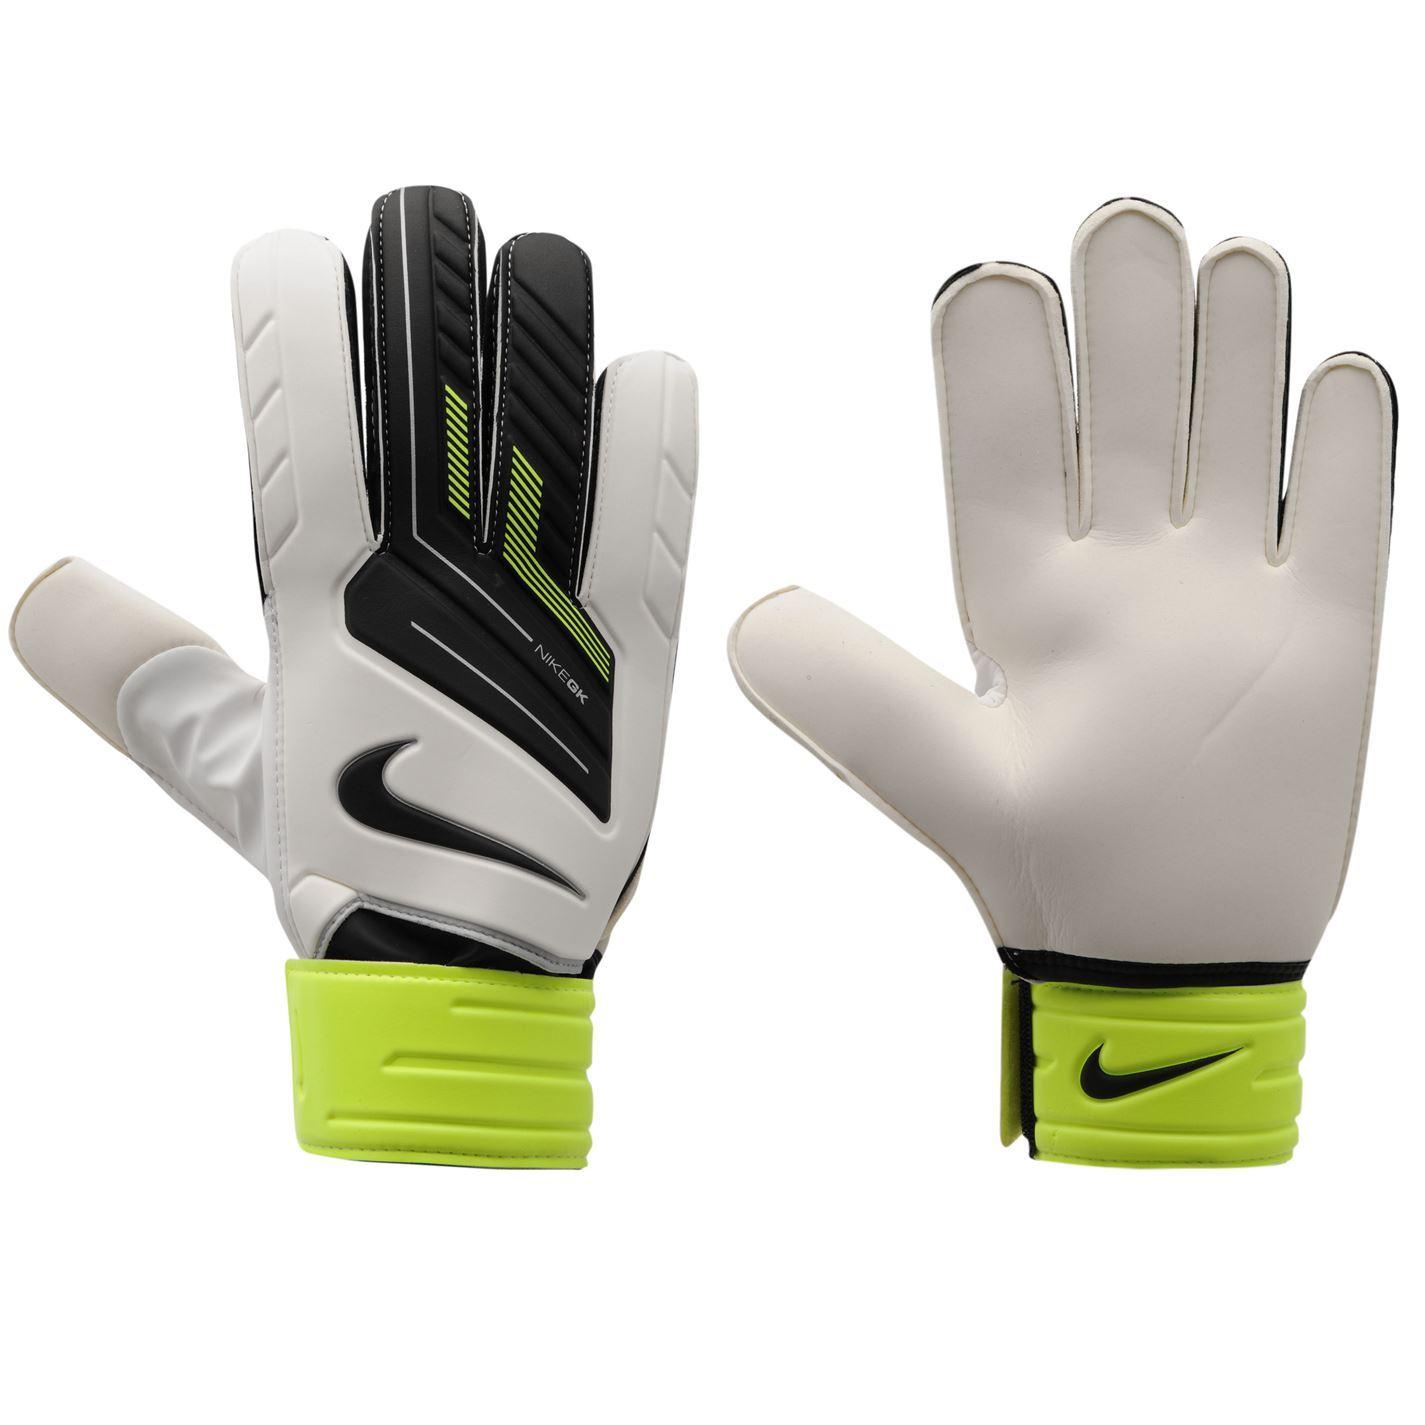 Nike Football Gloves Yellow: Nike GK Goalkeeper Classic Gloves 2013 14 Yellow Black